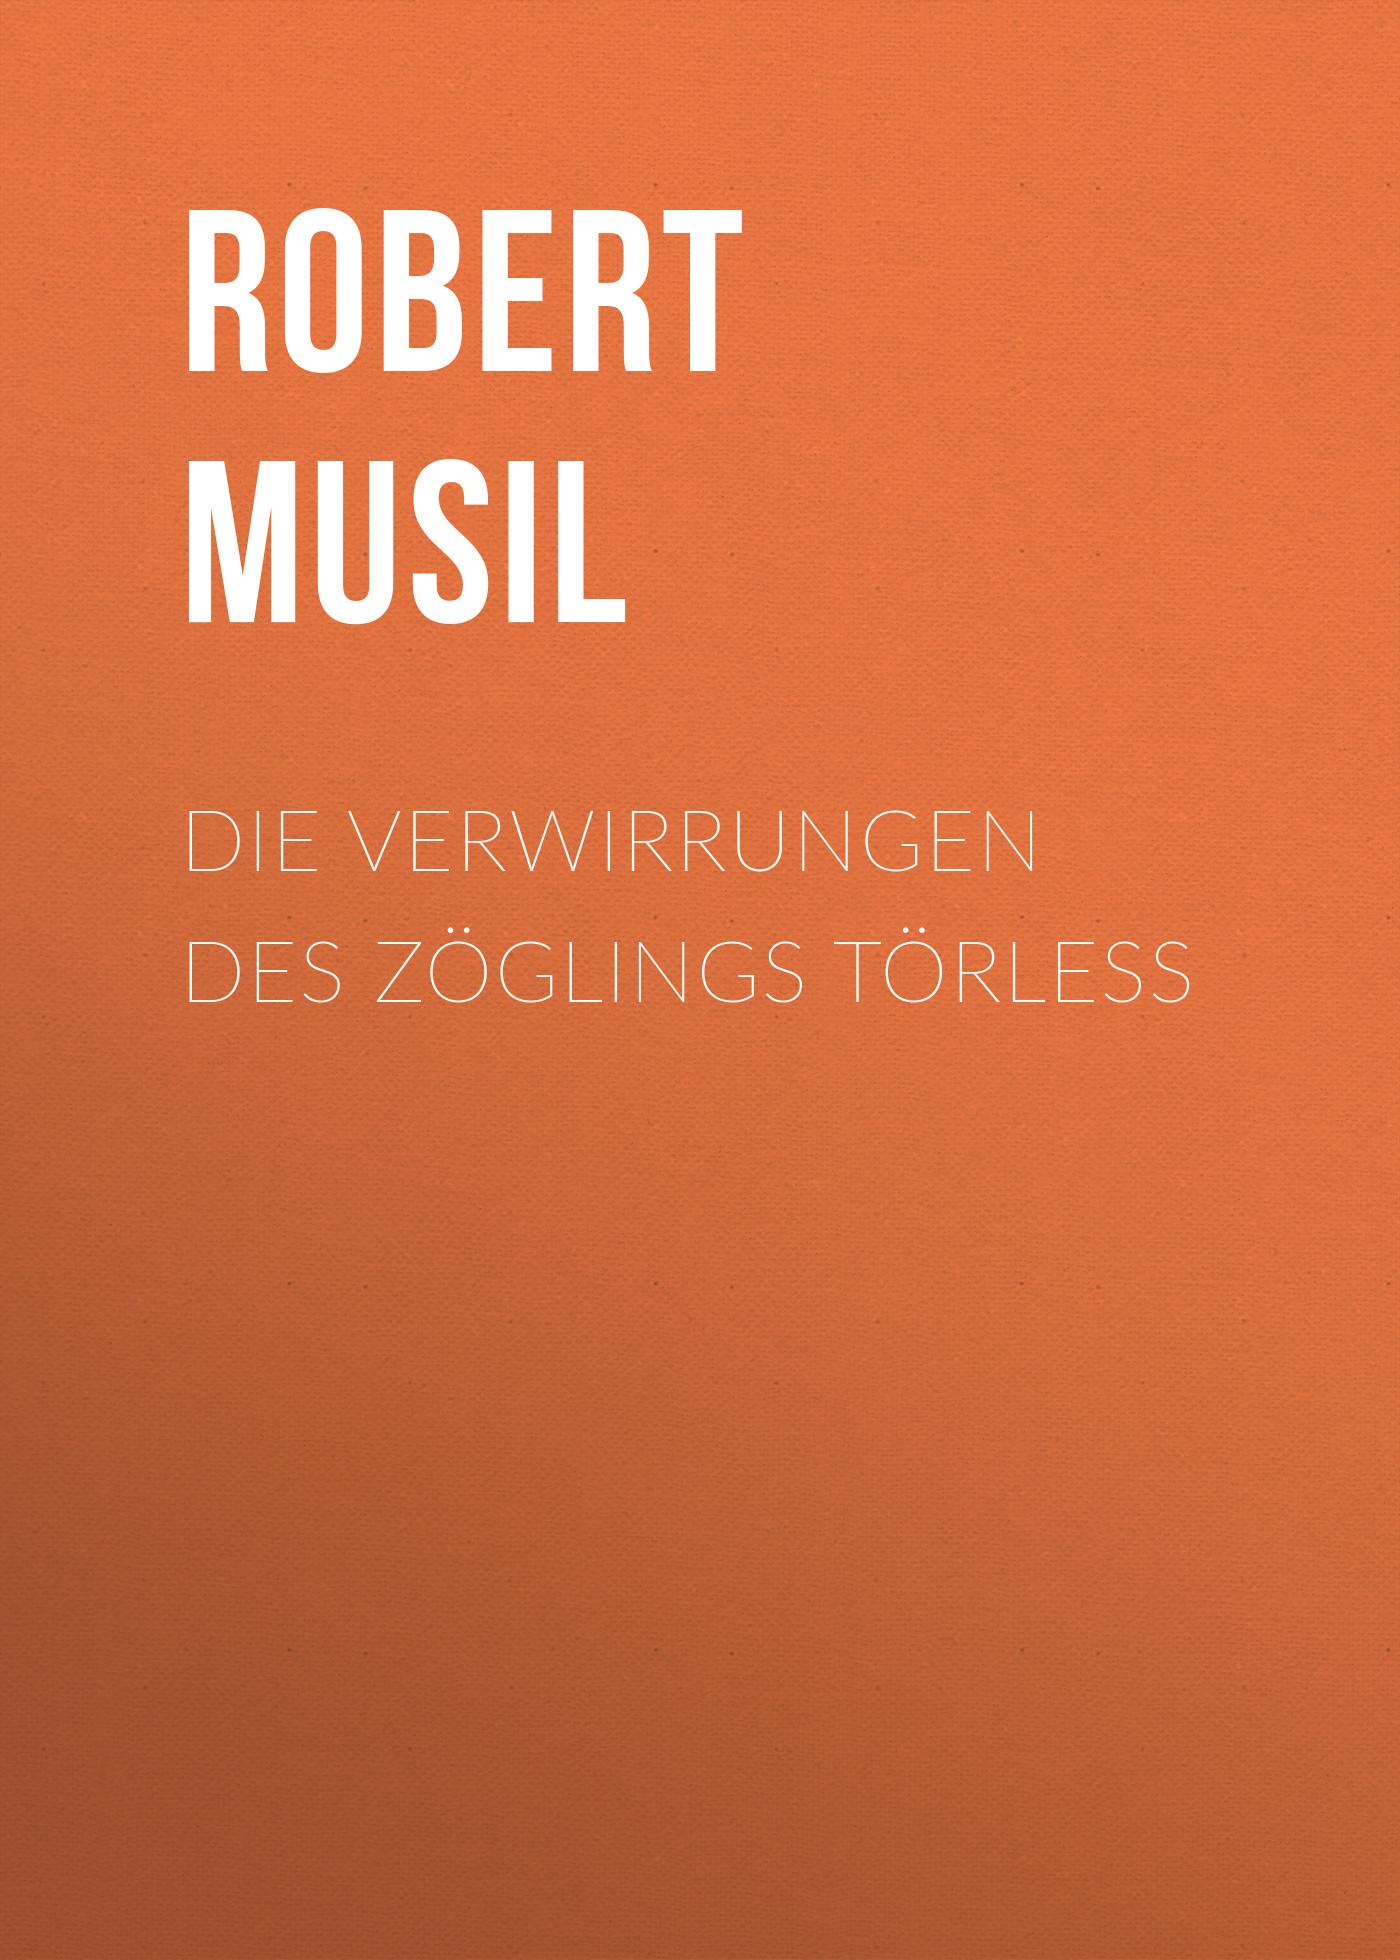 Robert Musil Die Verwirrungen des Zöglings Törless